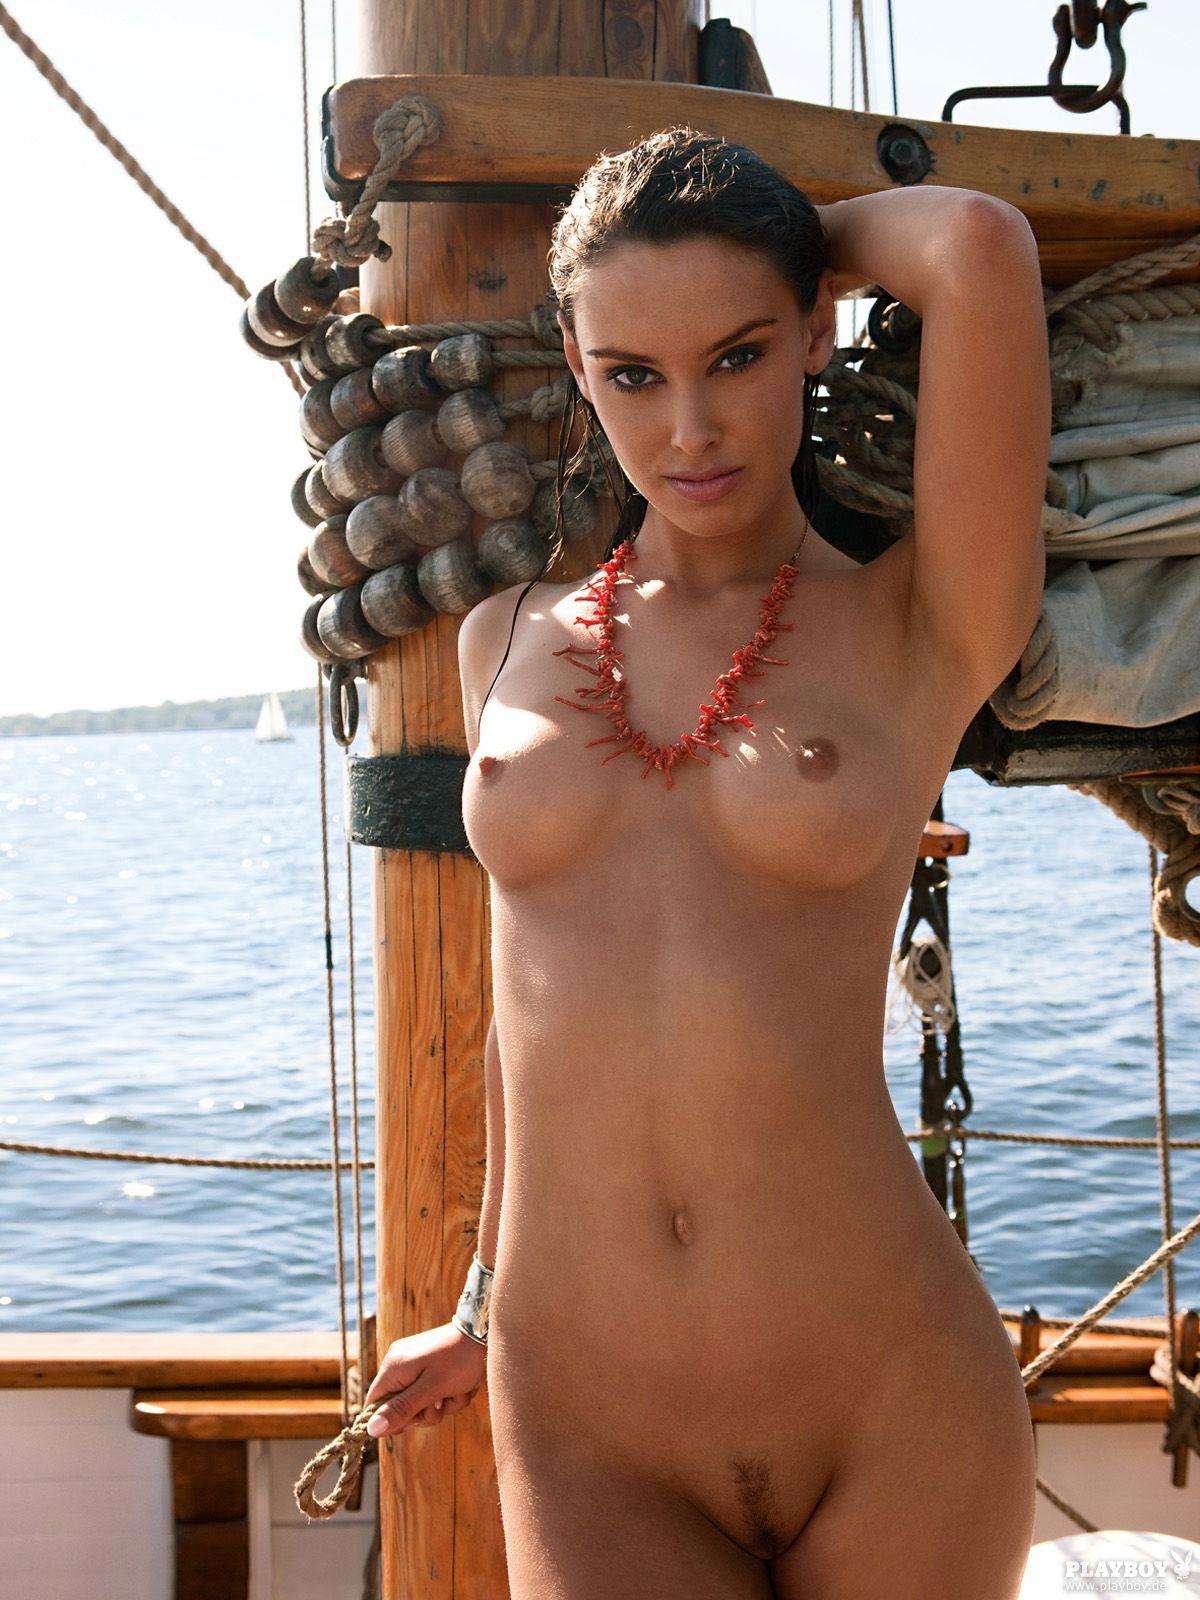 Sideboobs Miriam Rathmann nude (34 photos), Sexy, Bikini, Instagram, in bikini 2018